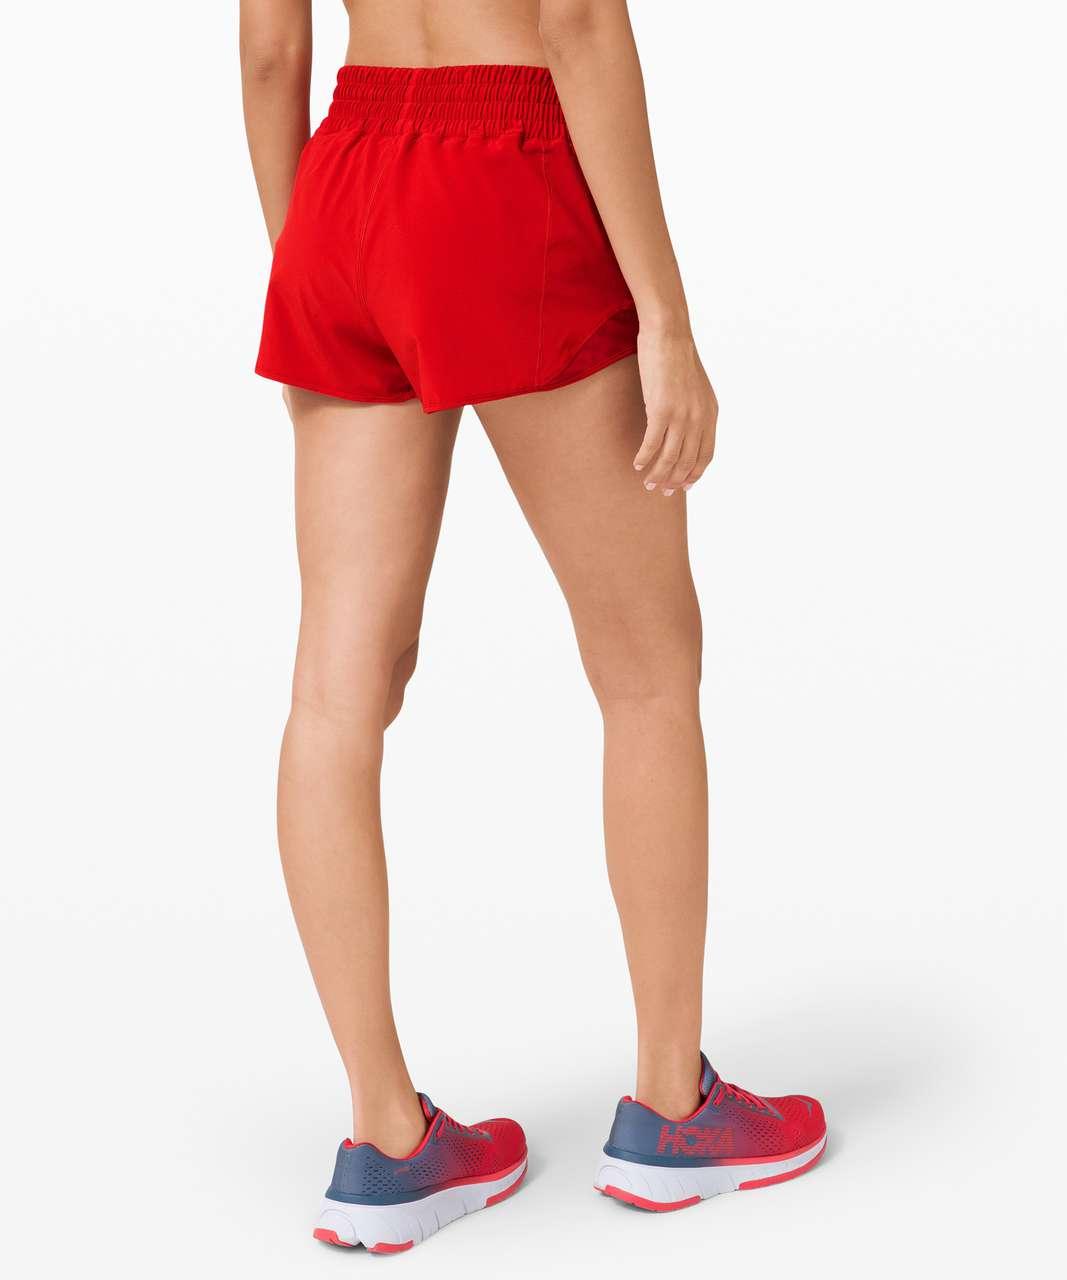 "Lululemon Hotty Hot Short *High-Rise 2.5"" - Dark Red"